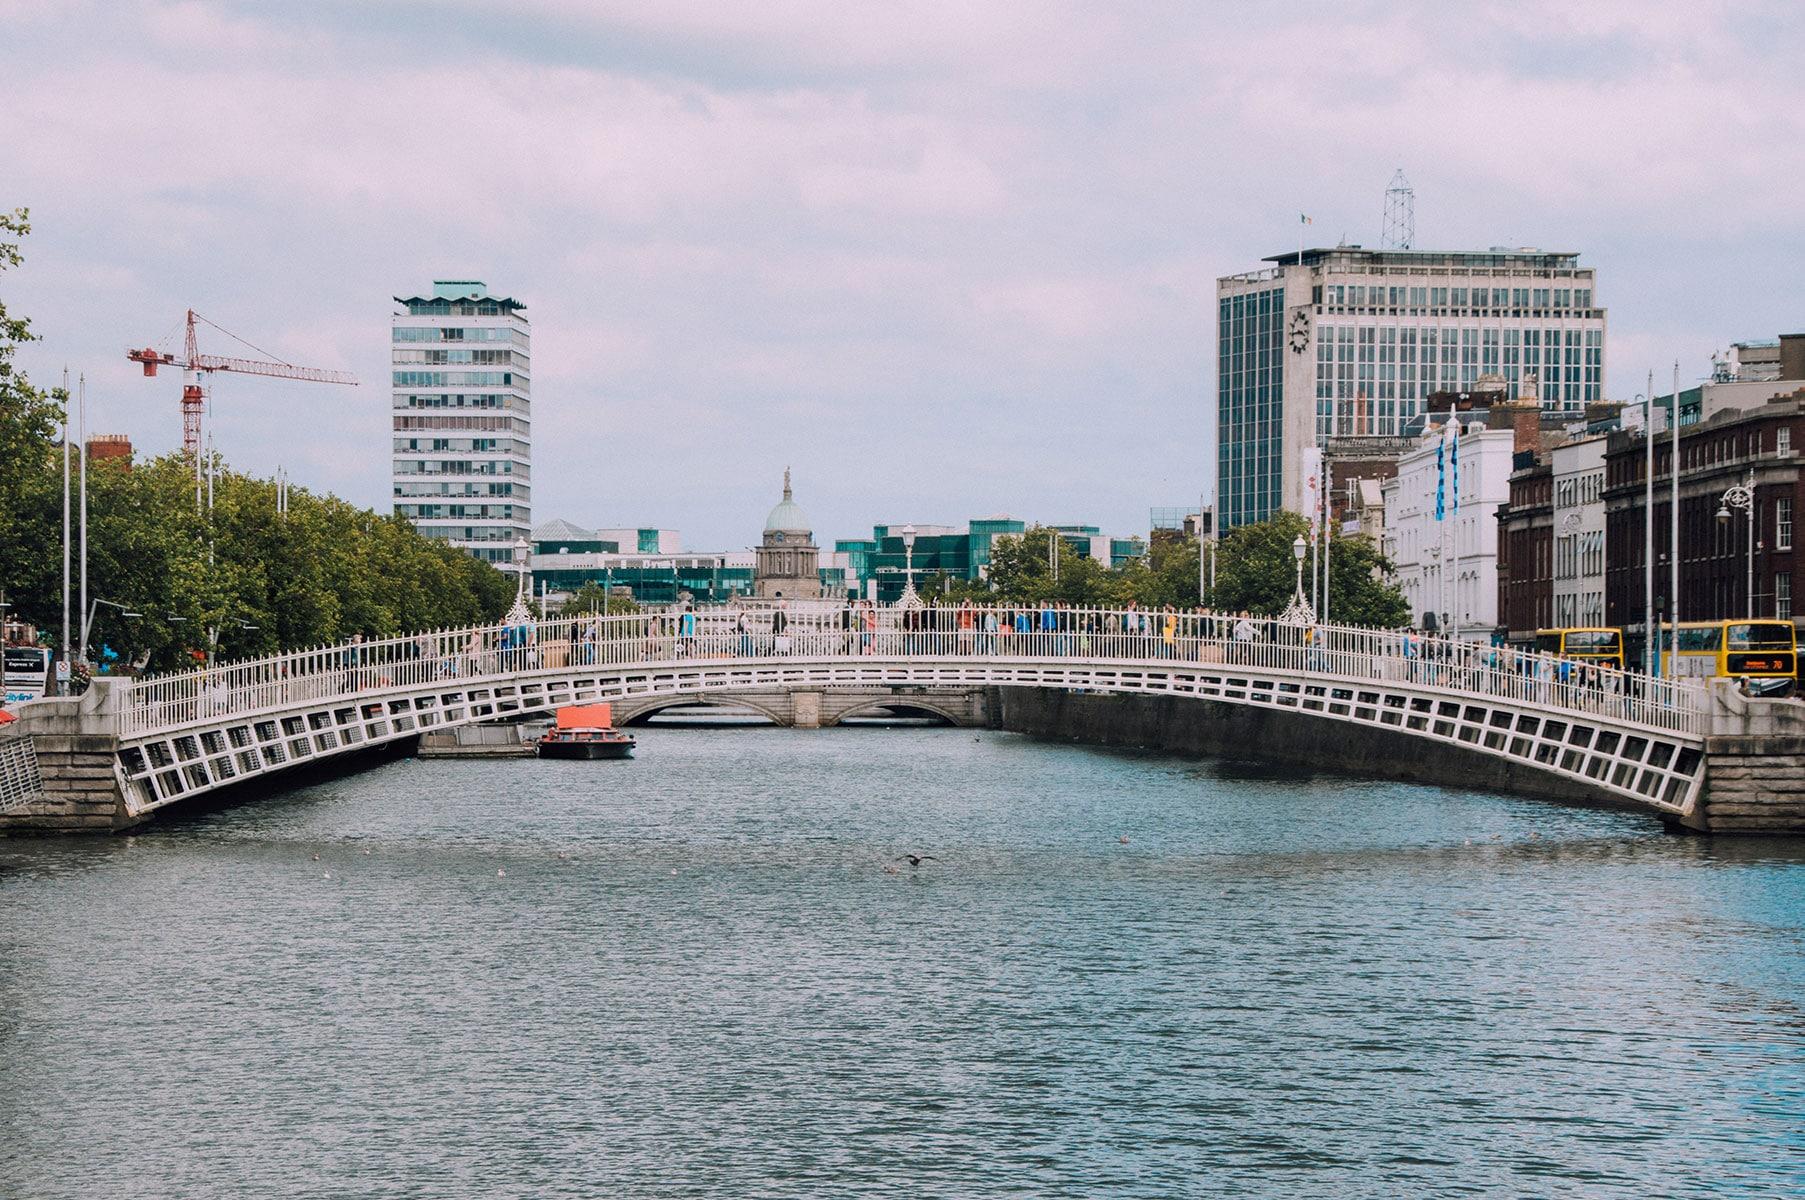 Dublin Happenny Bridge